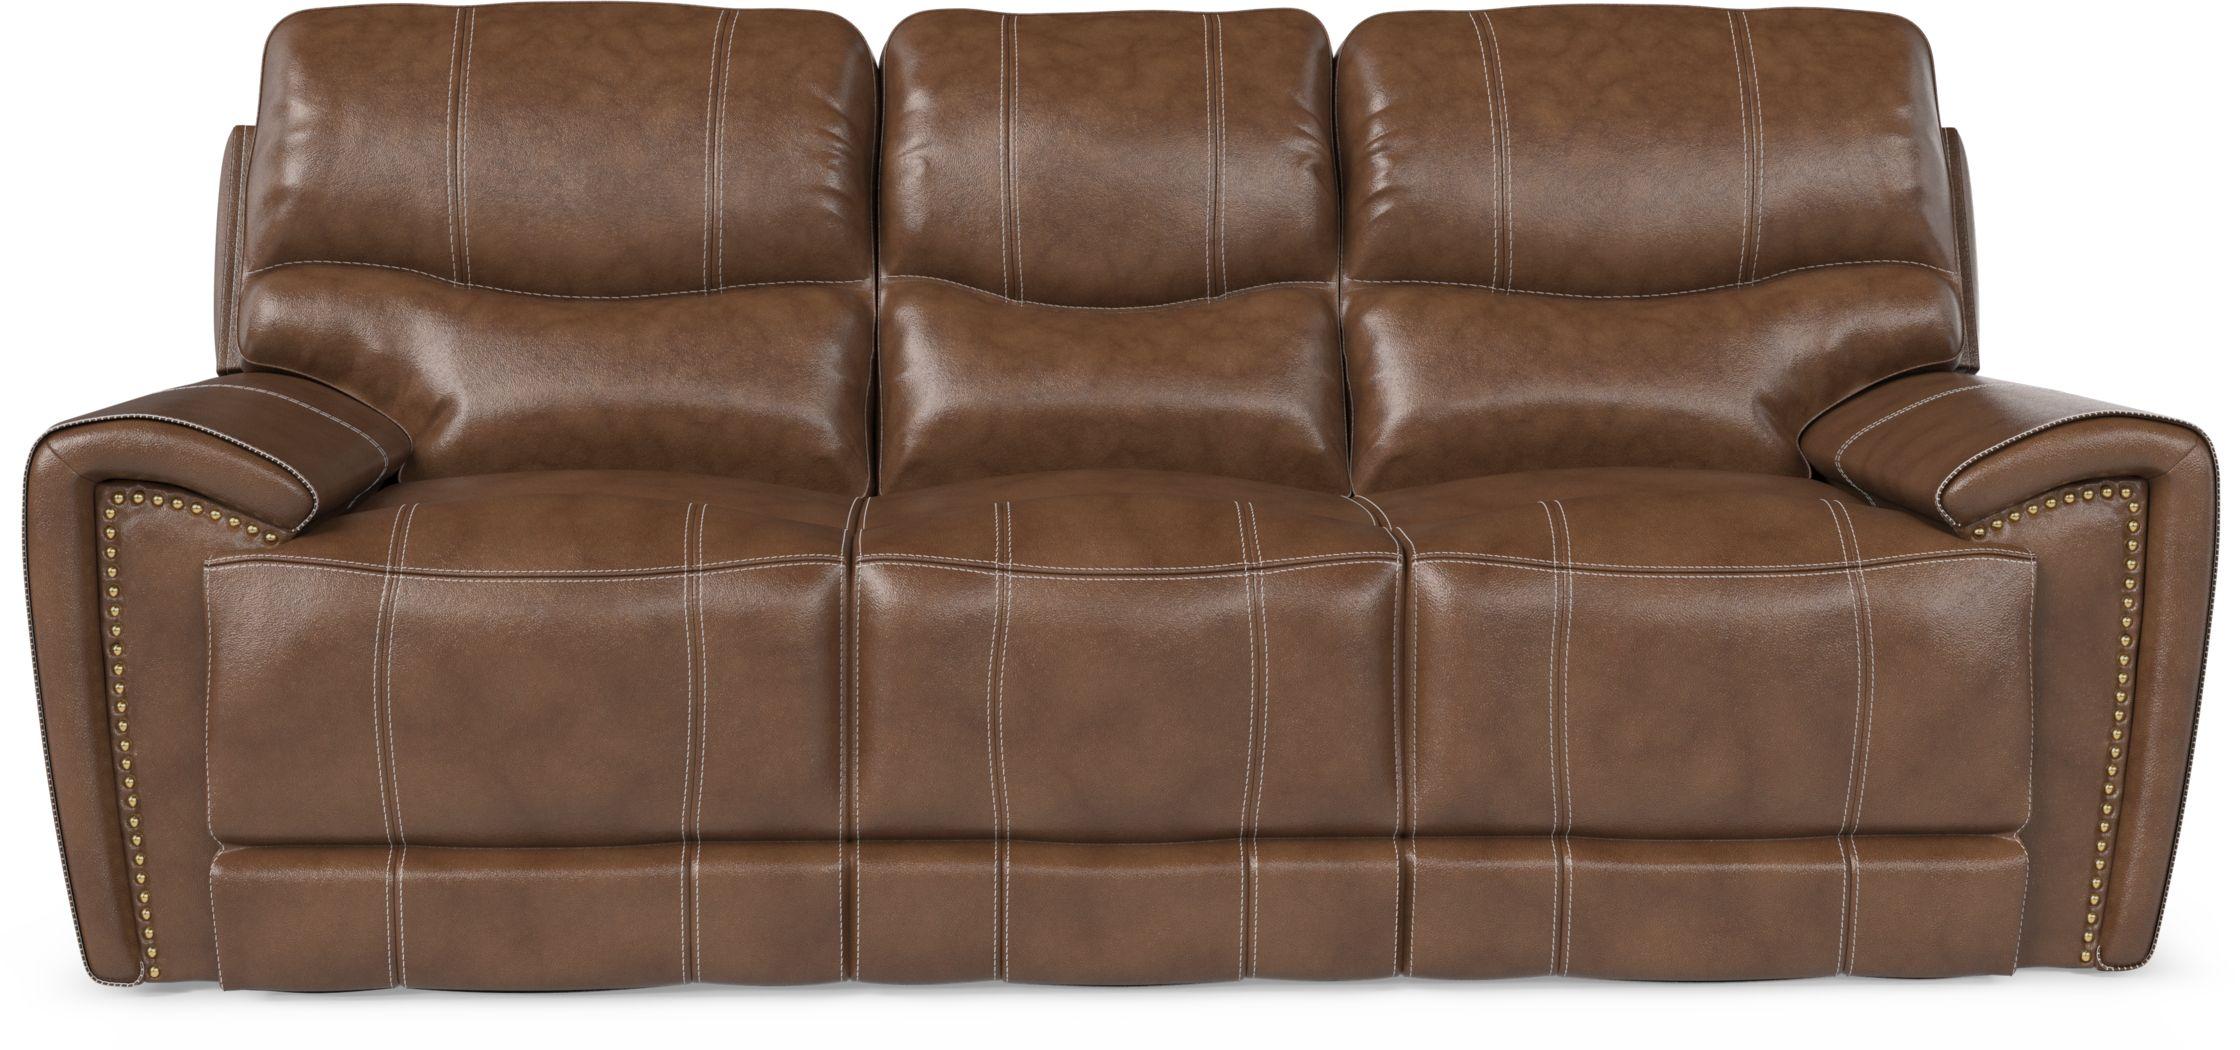 Italo Brown Leather Power Plus Reclining Sofa